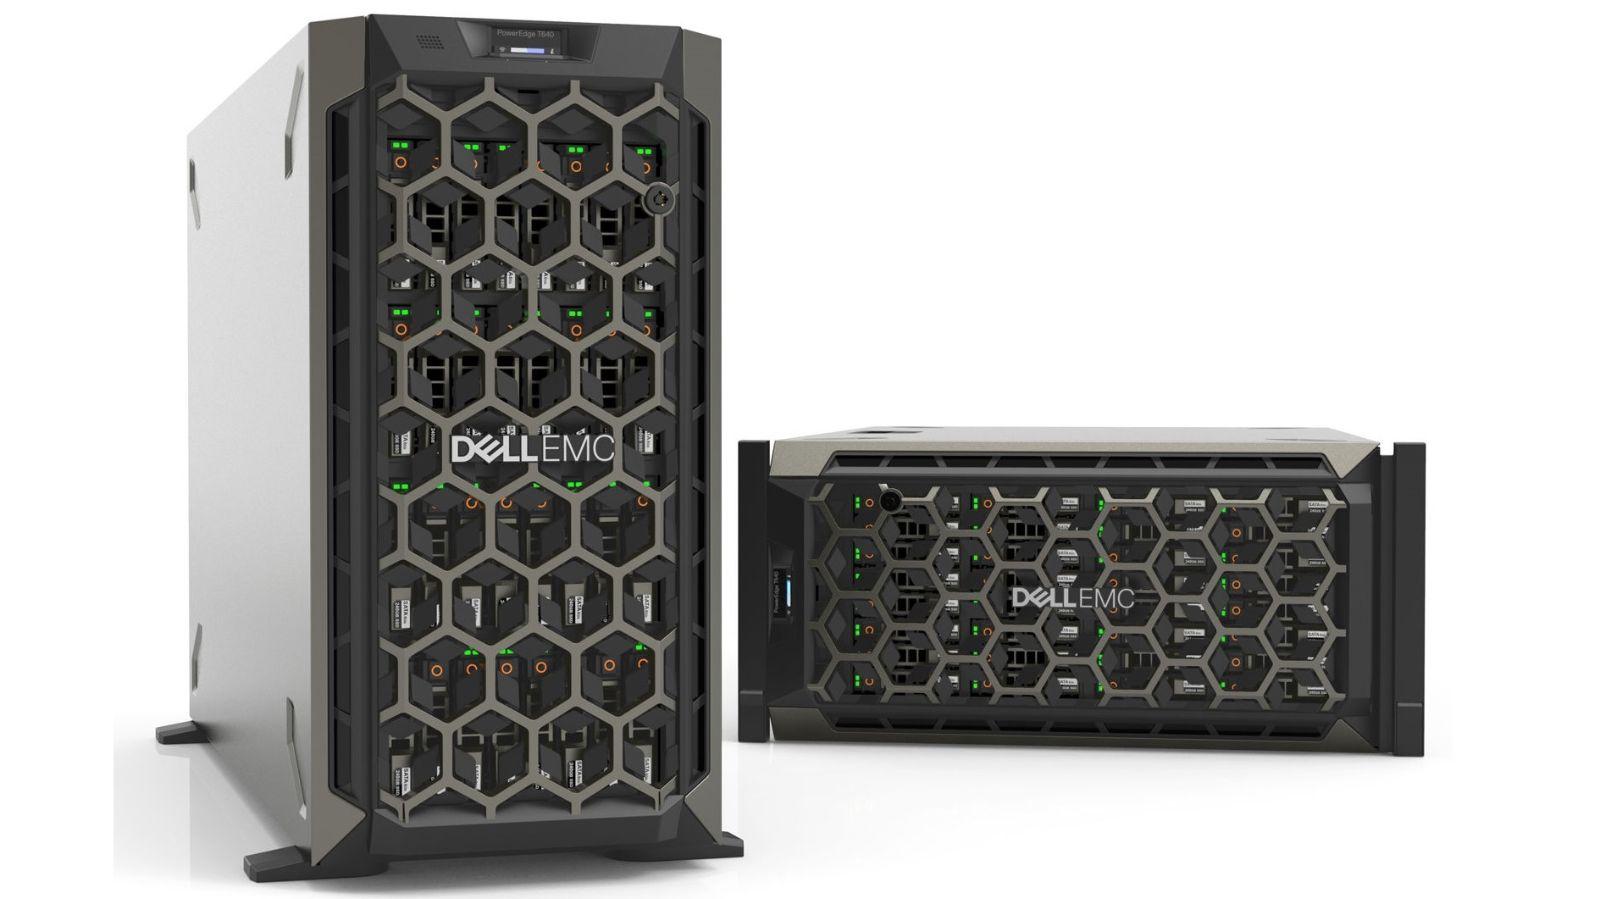 SLN310171_en_US__3enterprise-servers-poweredge-t640